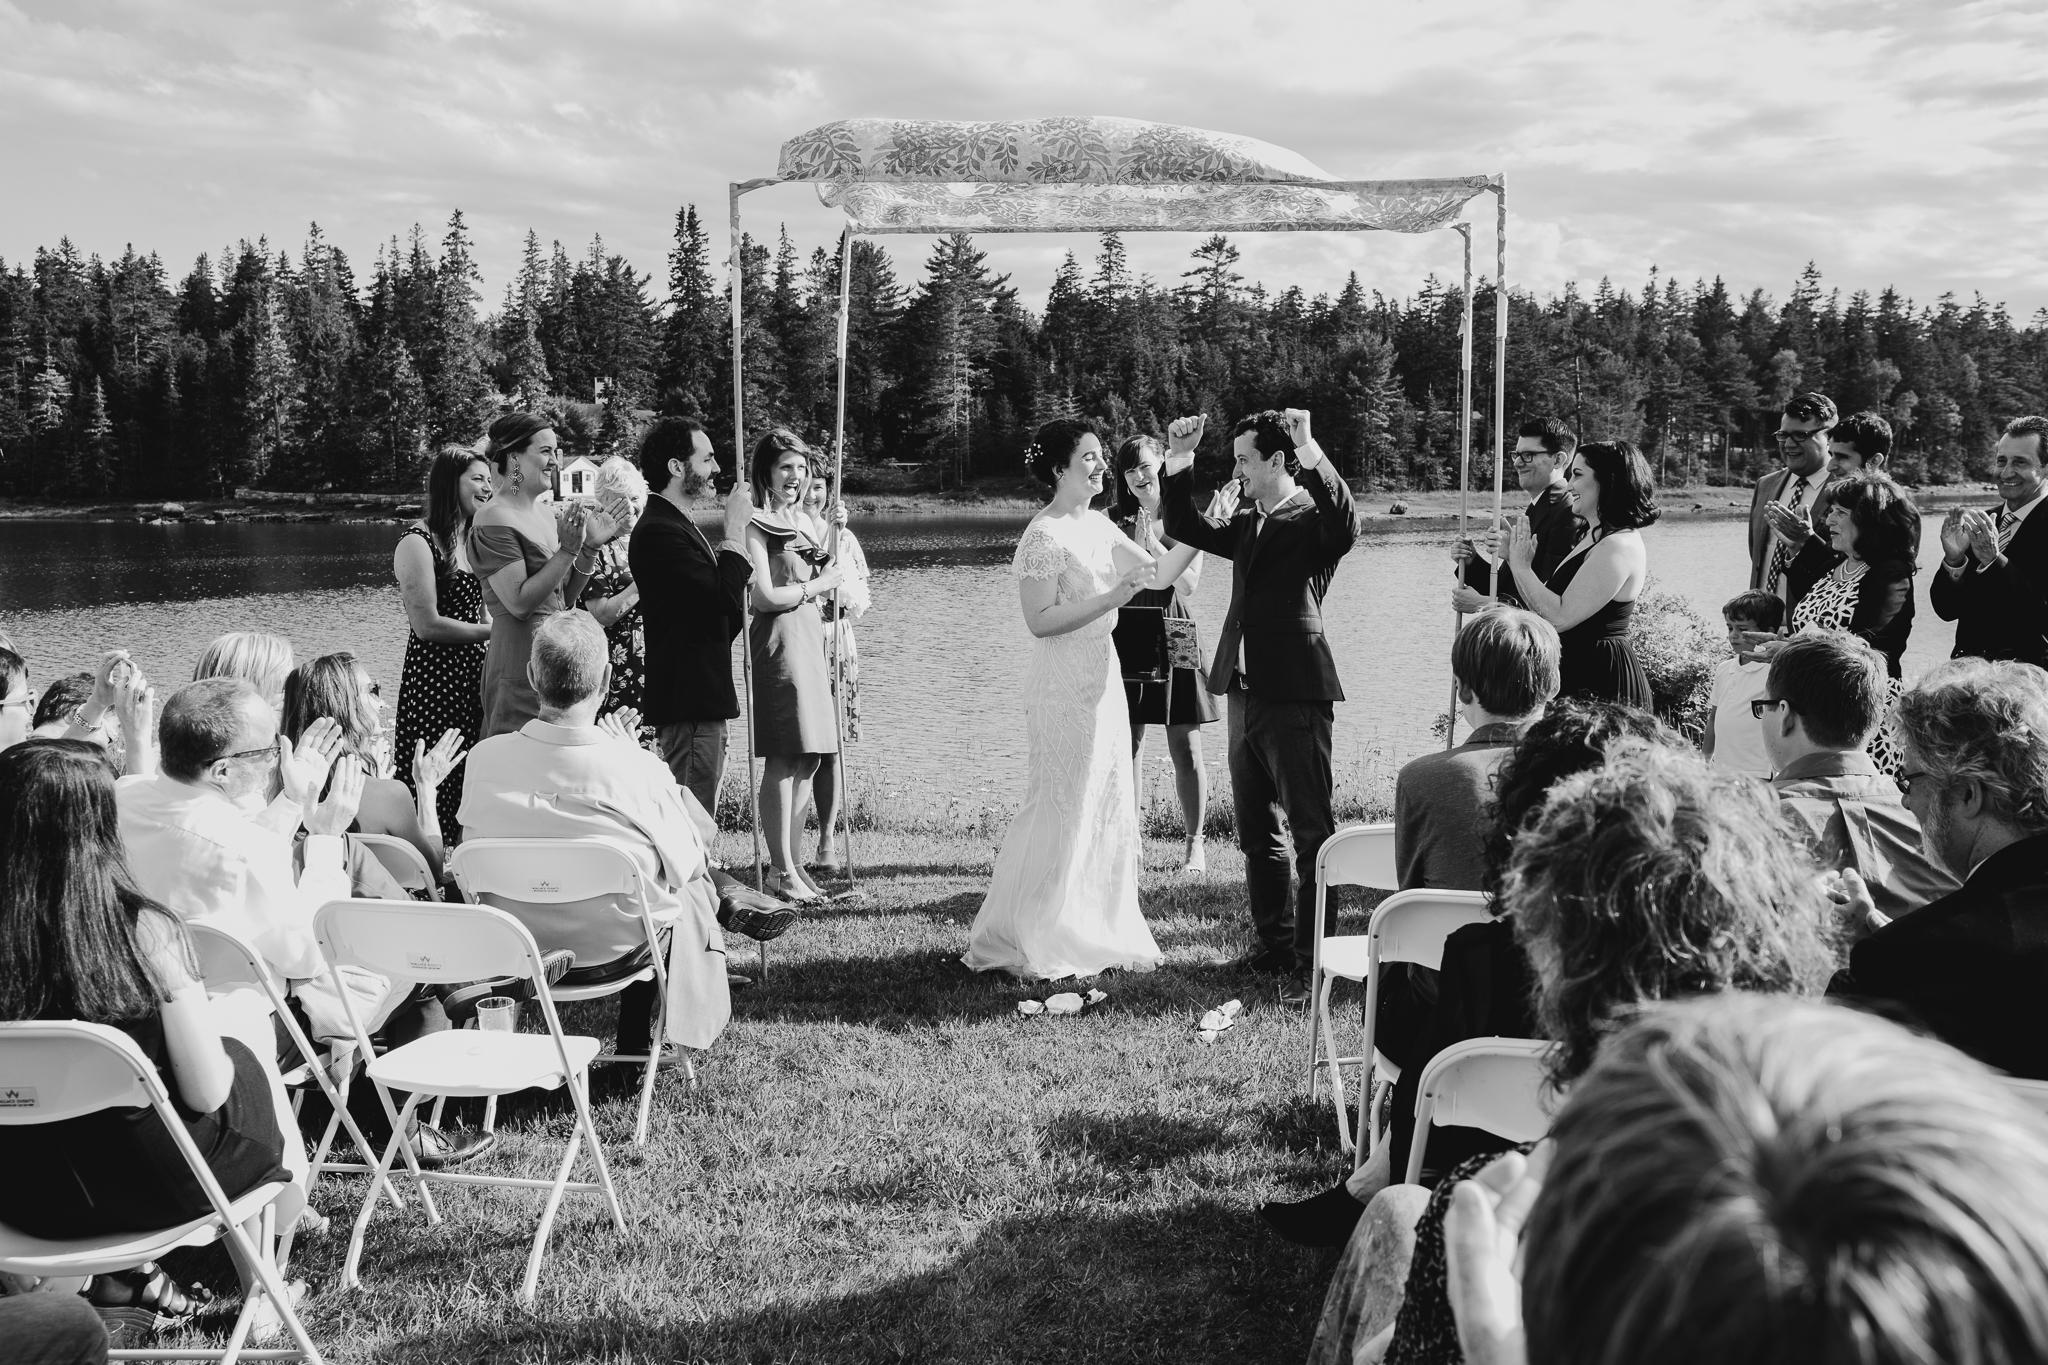 erinwheatco-1372 Maine Wedding by the Sea | Ruth & Ryan